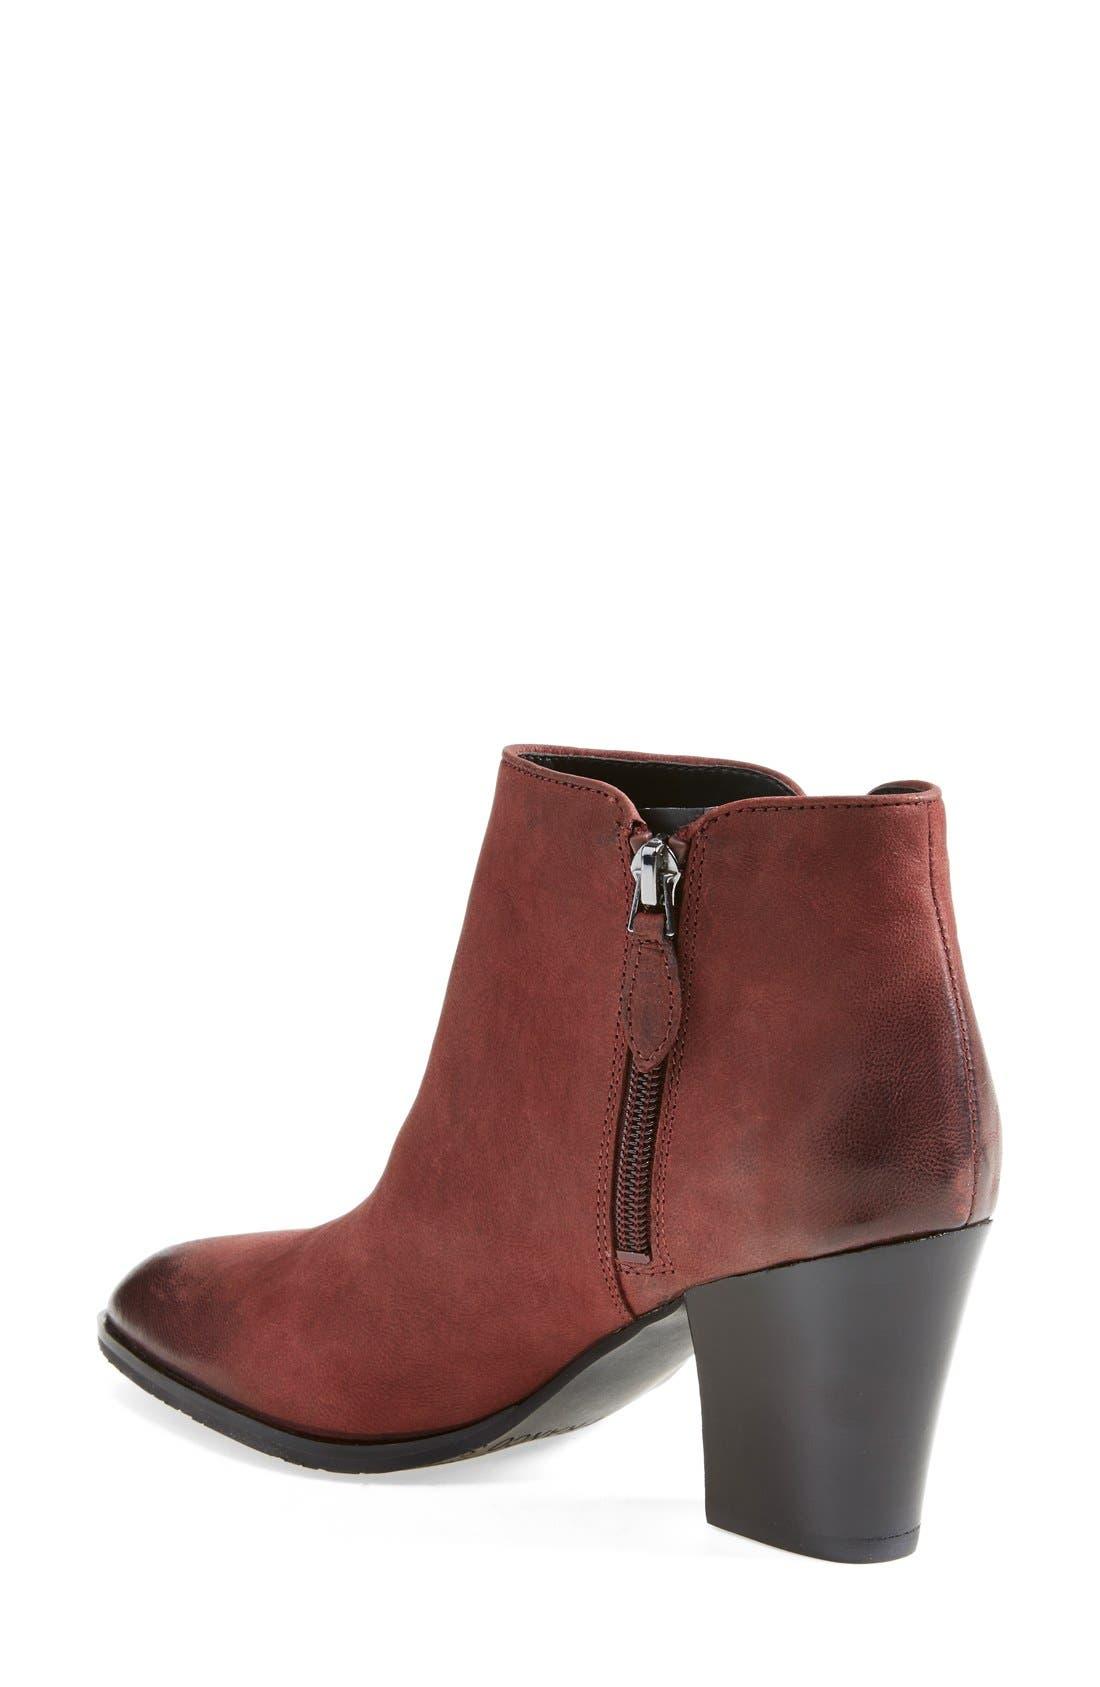 Alternate Image 2  - Franco Sarto 'Agenda' Leather Bootie (Women)